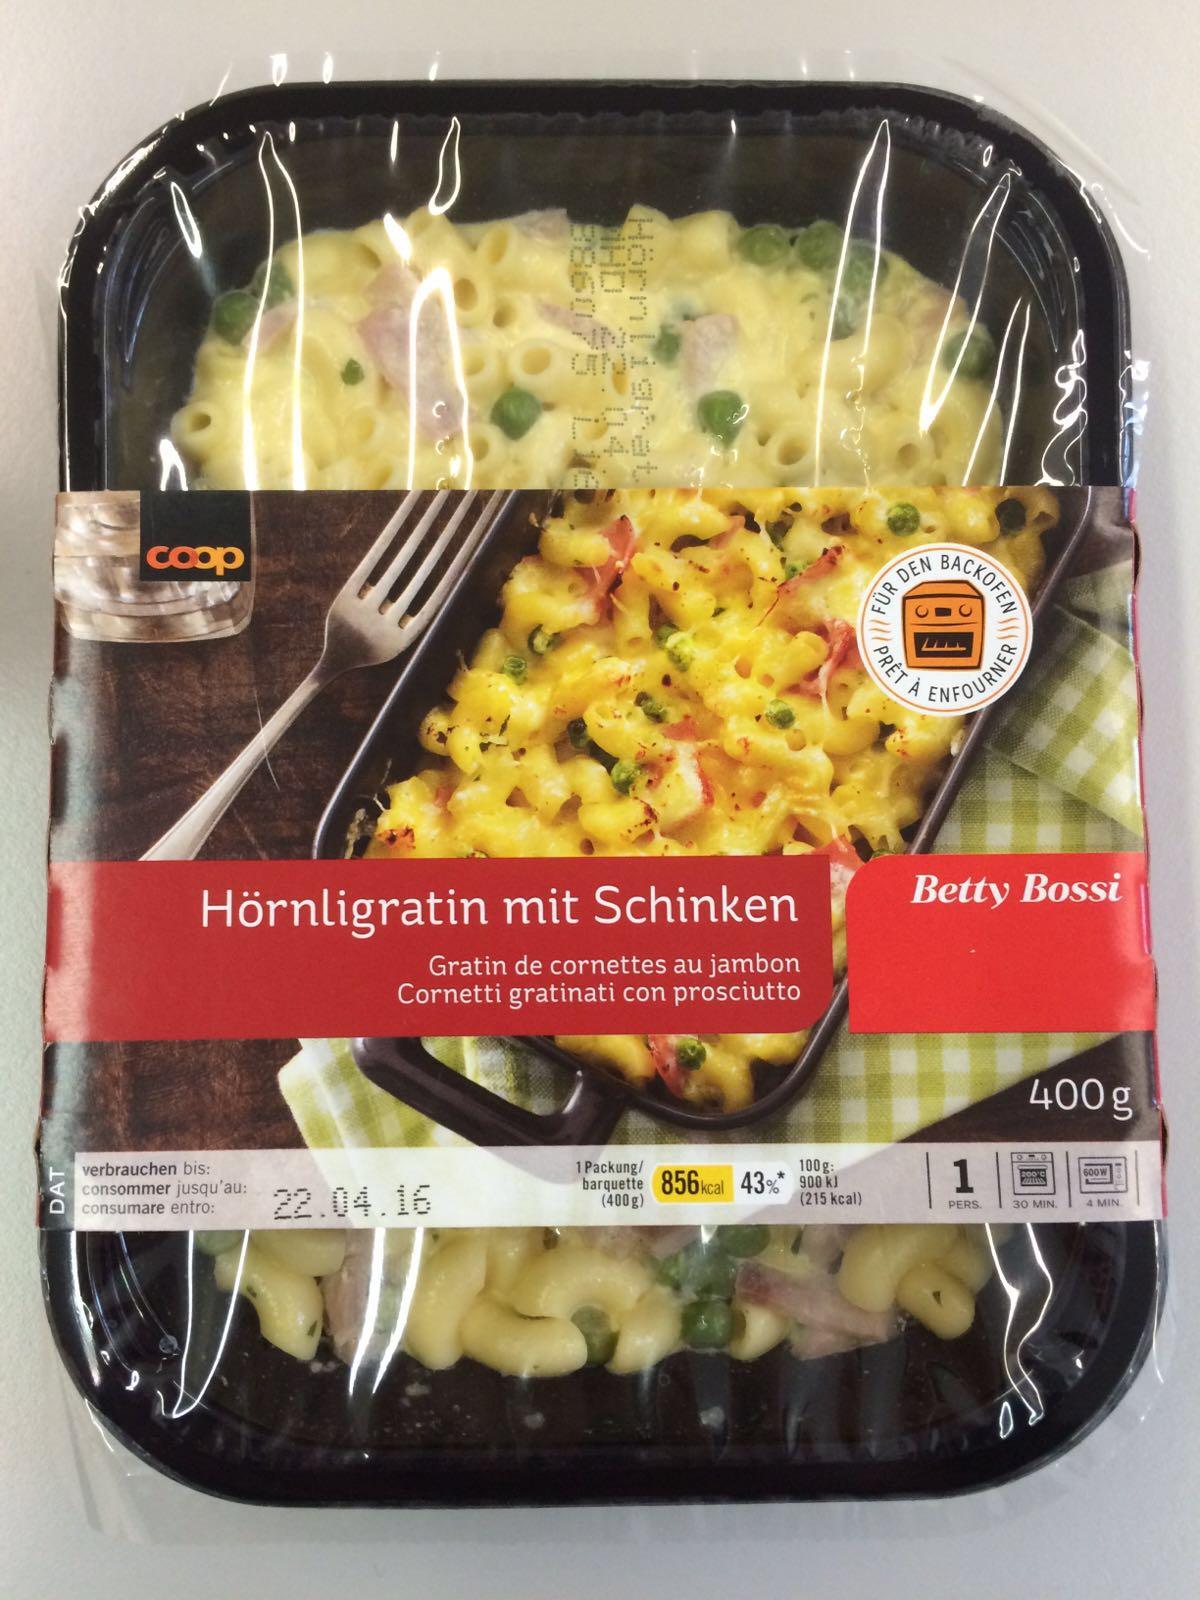 h__rnligratin-mit-schinken-verpackt.jpg